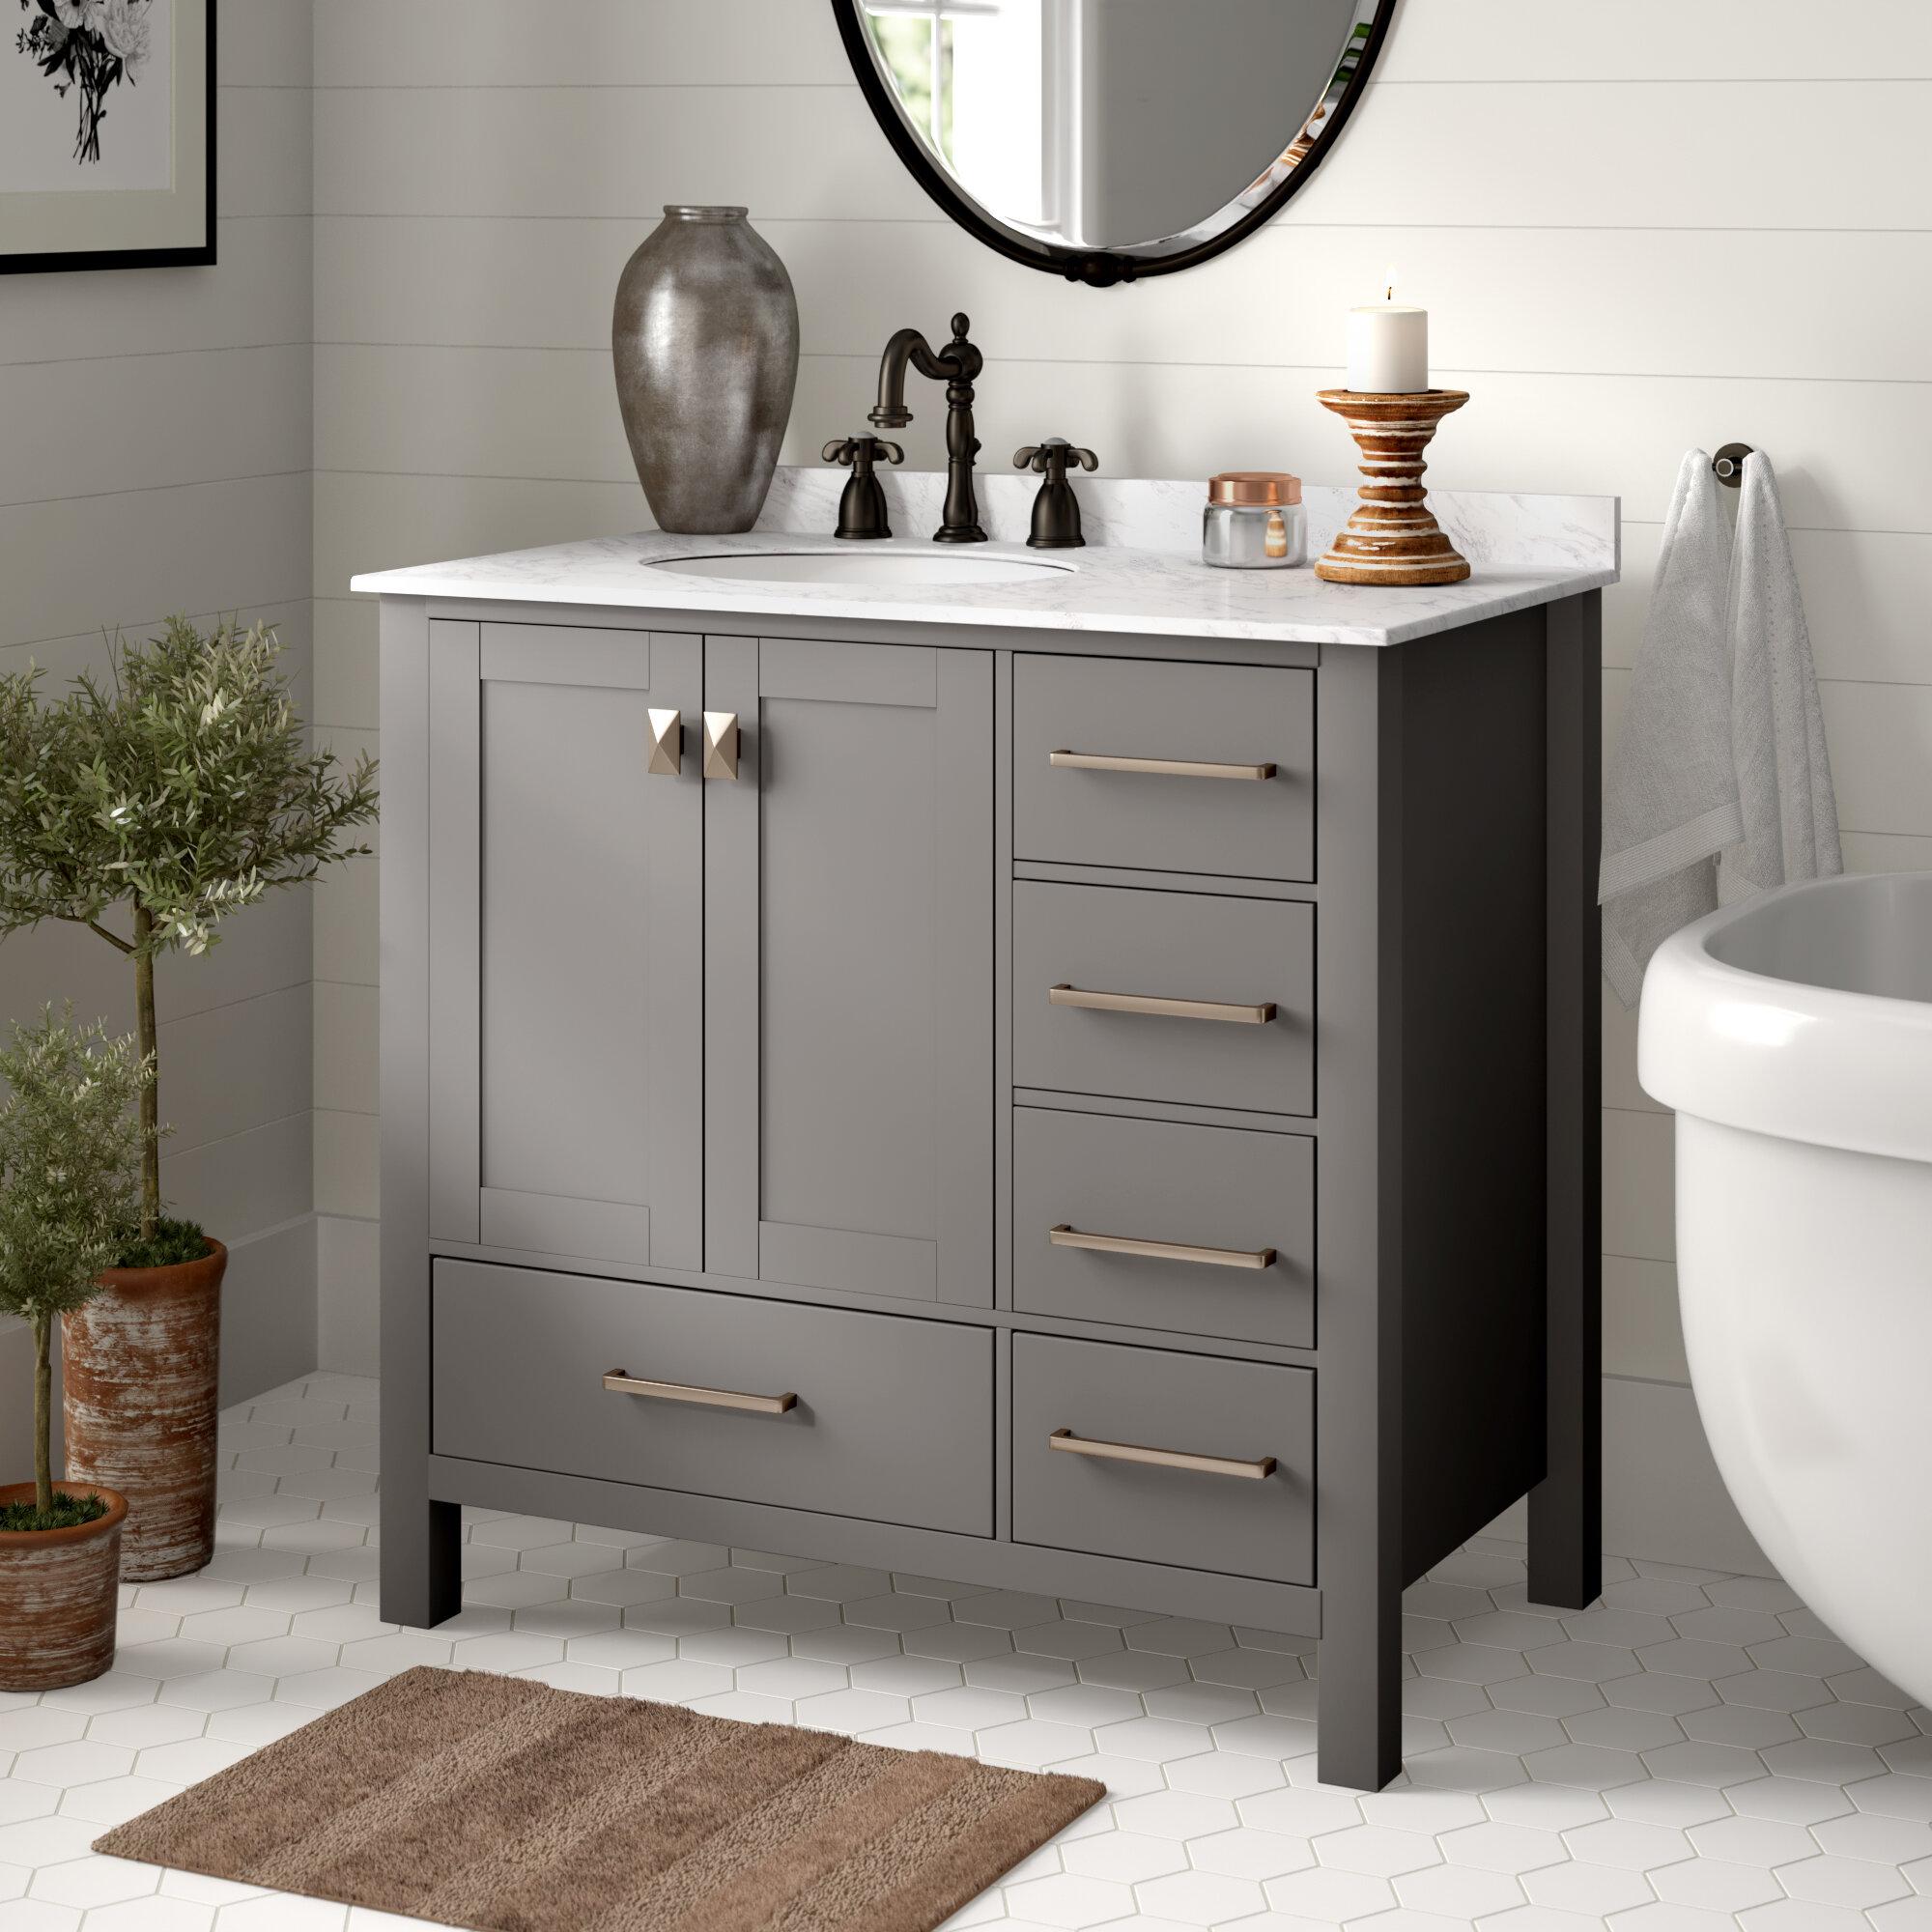 Awesome Newtown 36 Single Bathroom Vanity Set Interior Design Ideas Clesiryabchikinfo